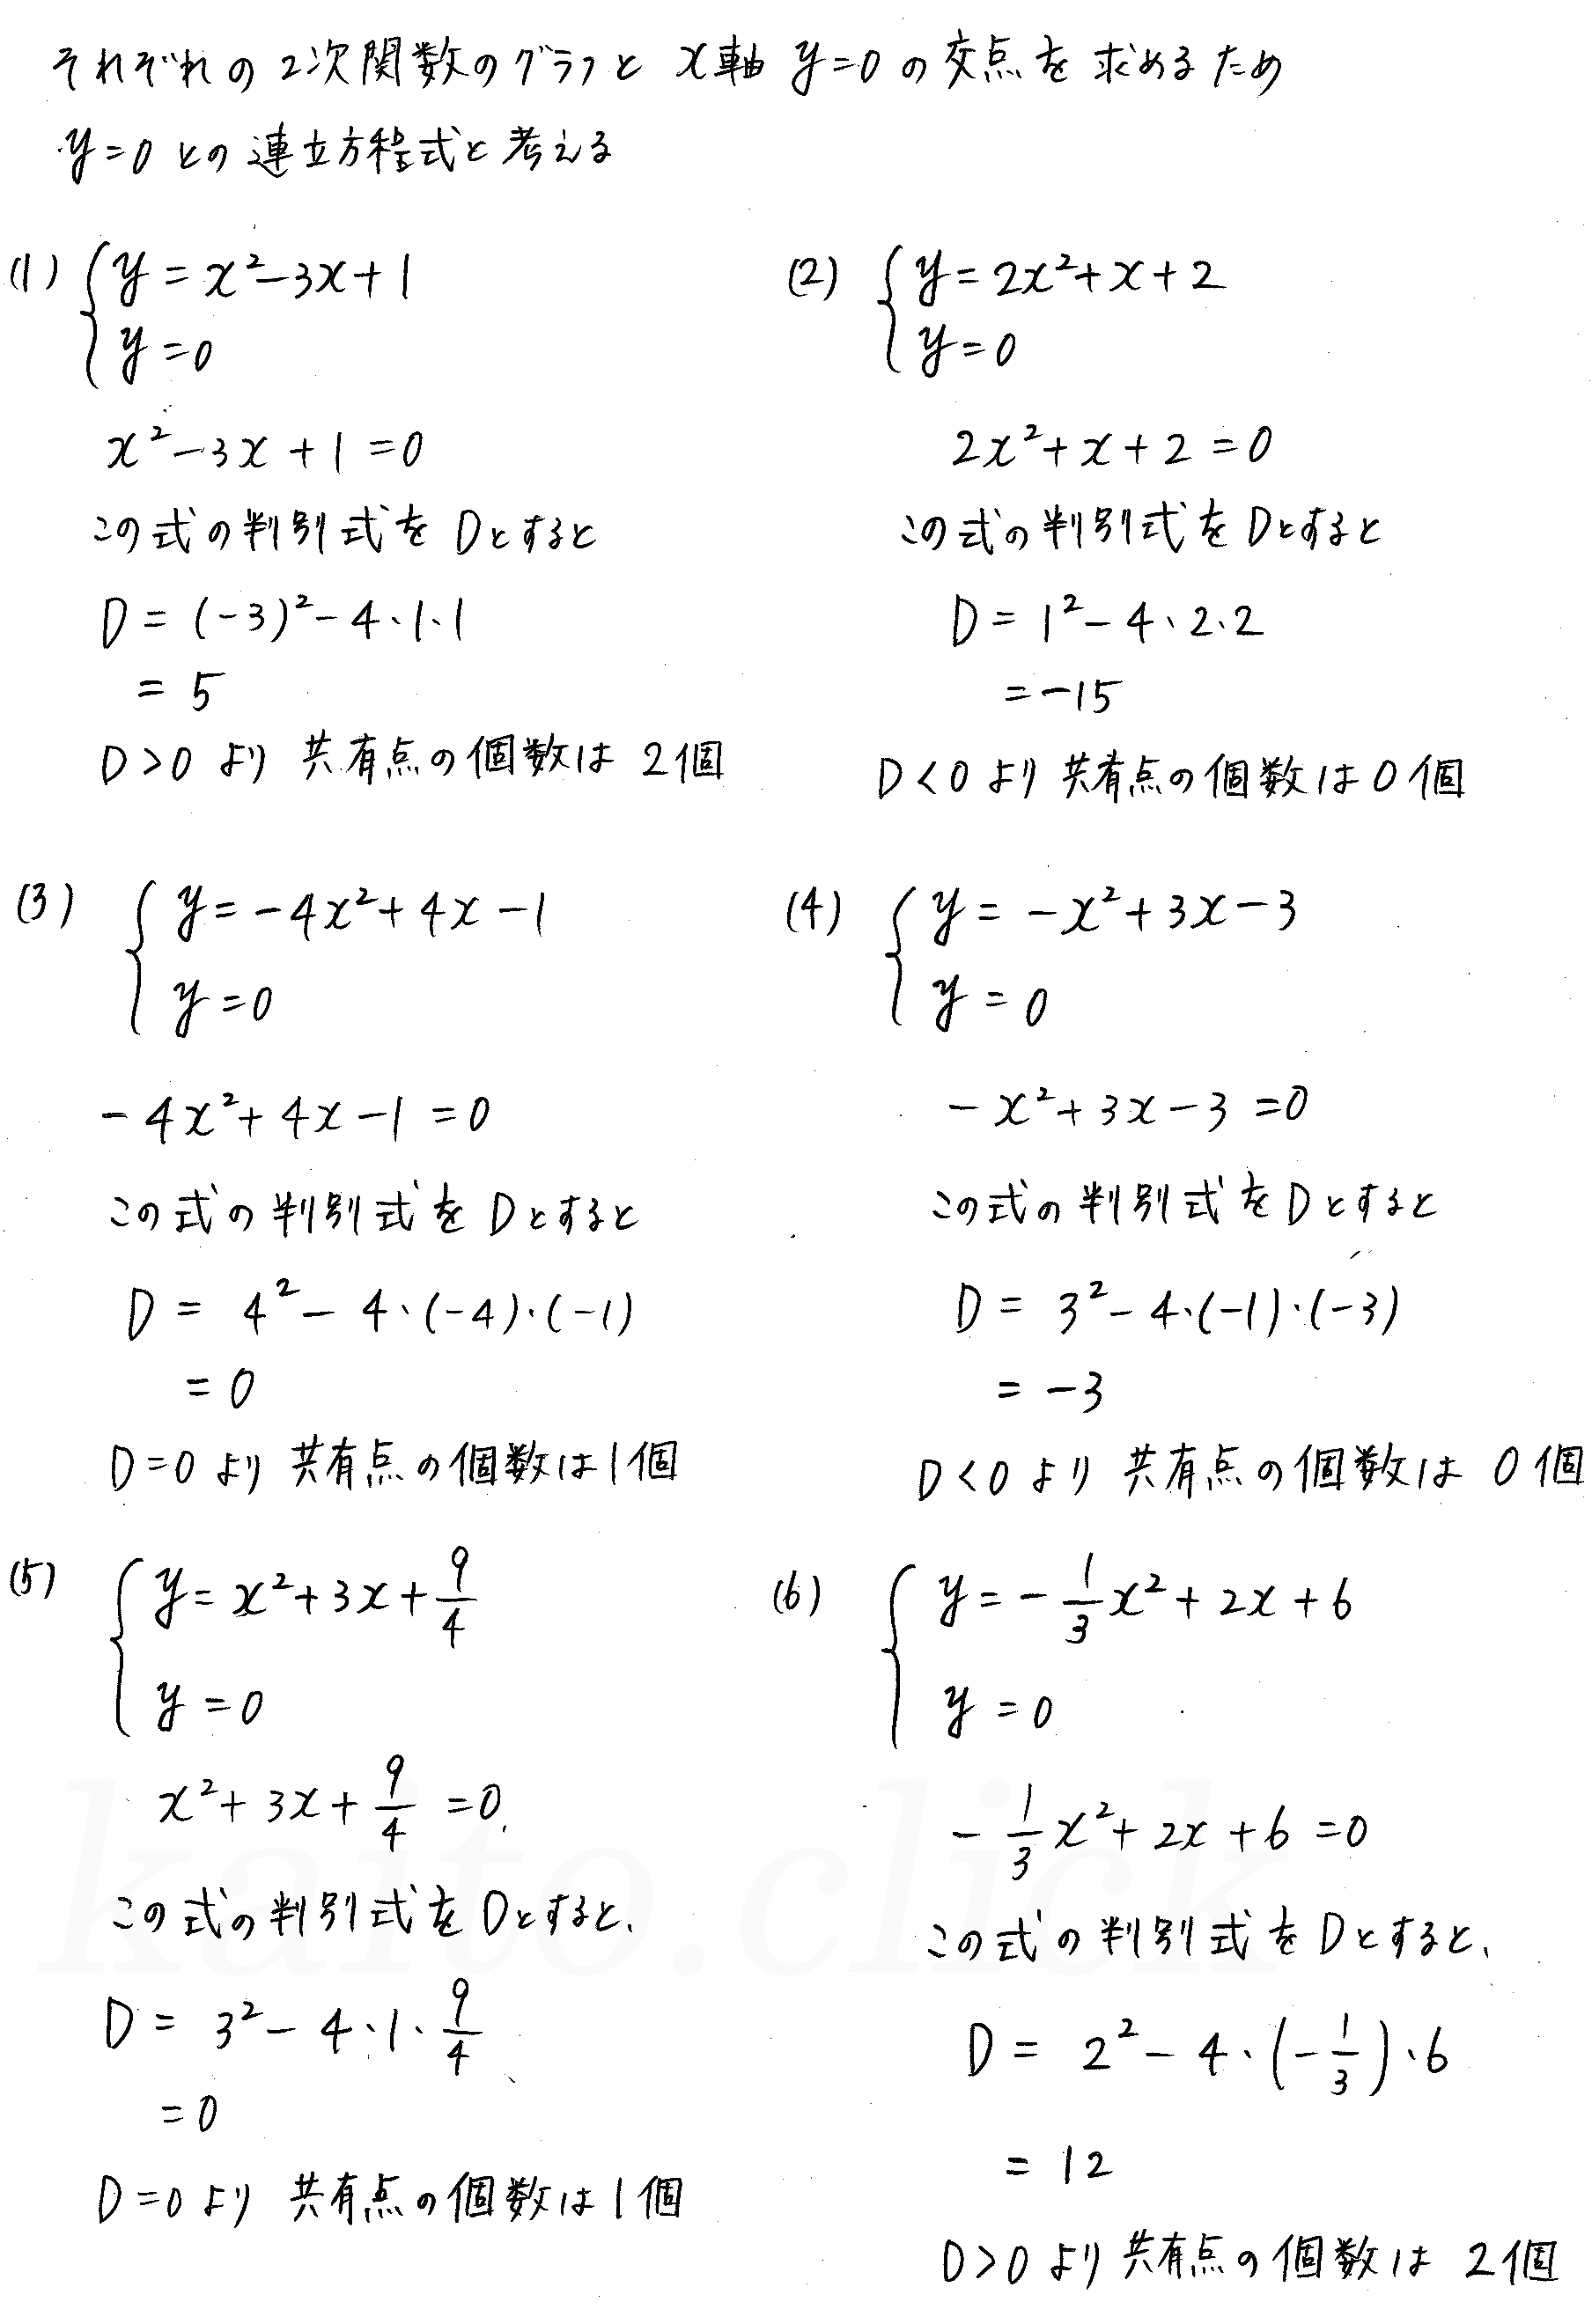 3TRIAL数学Ⅰ-172解答